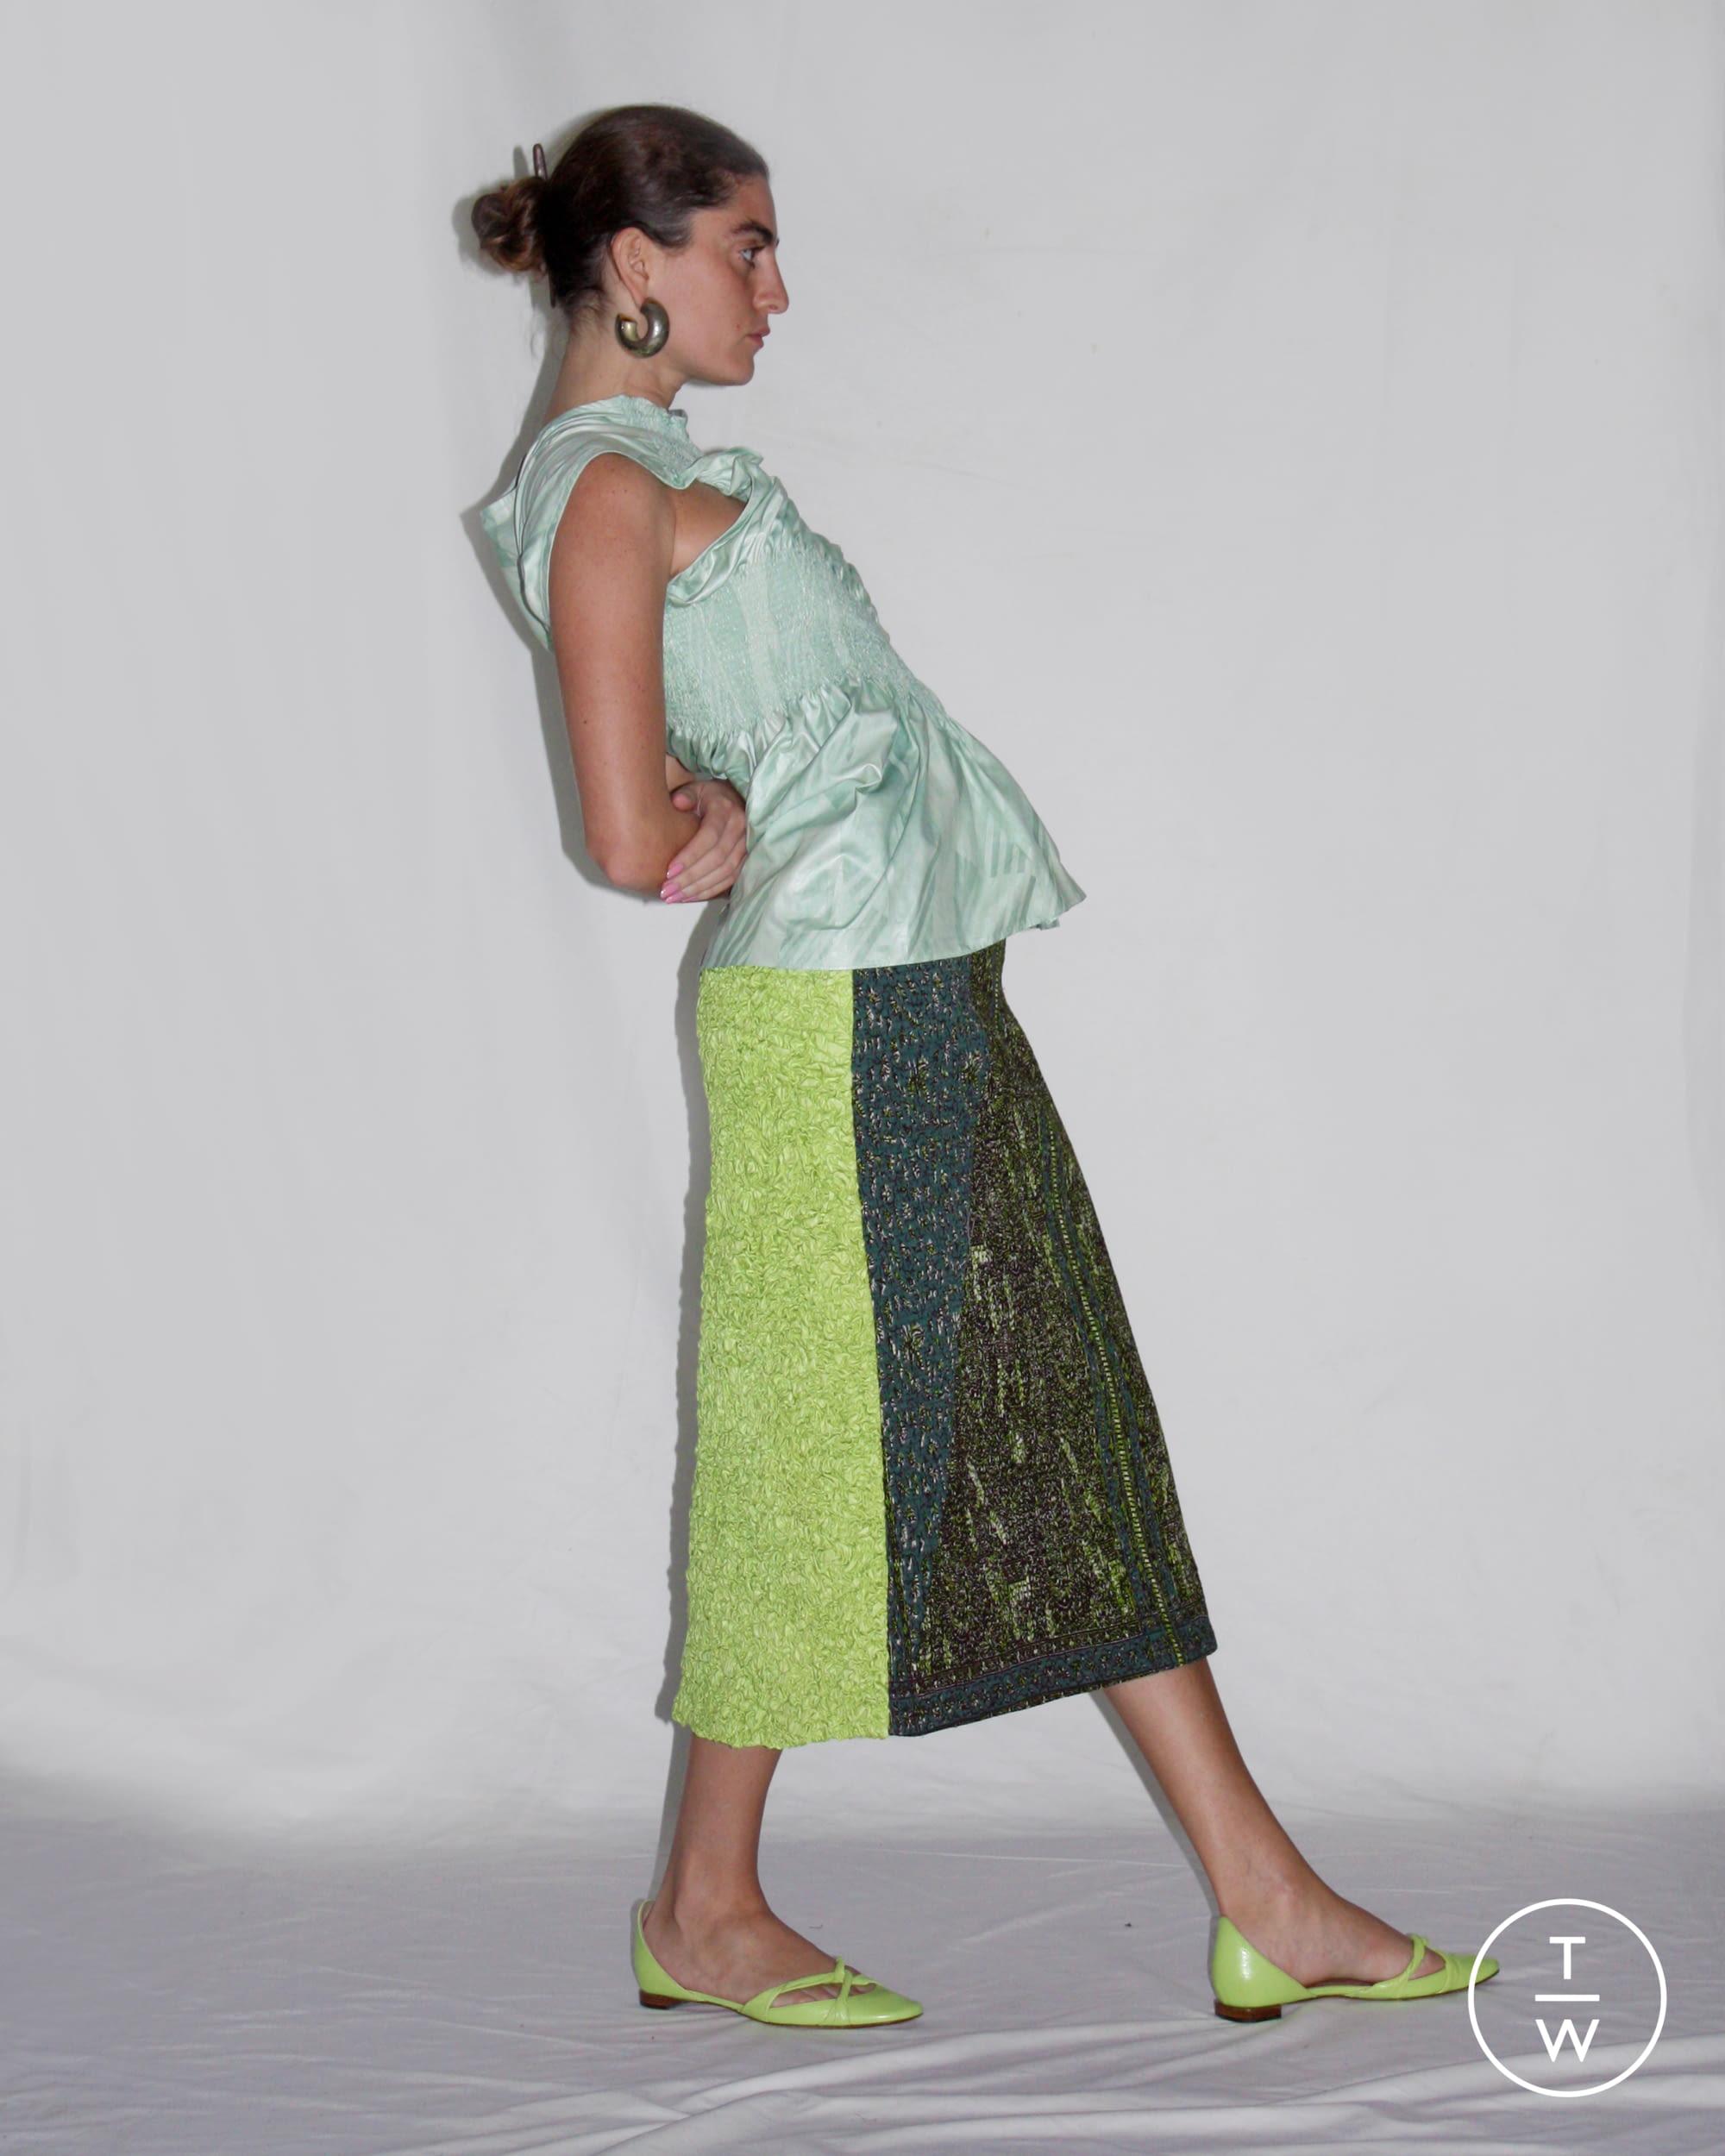 Tappezzeria Trompe L Oeil super yaya ss20 womenswear #7 - the fashion search engine